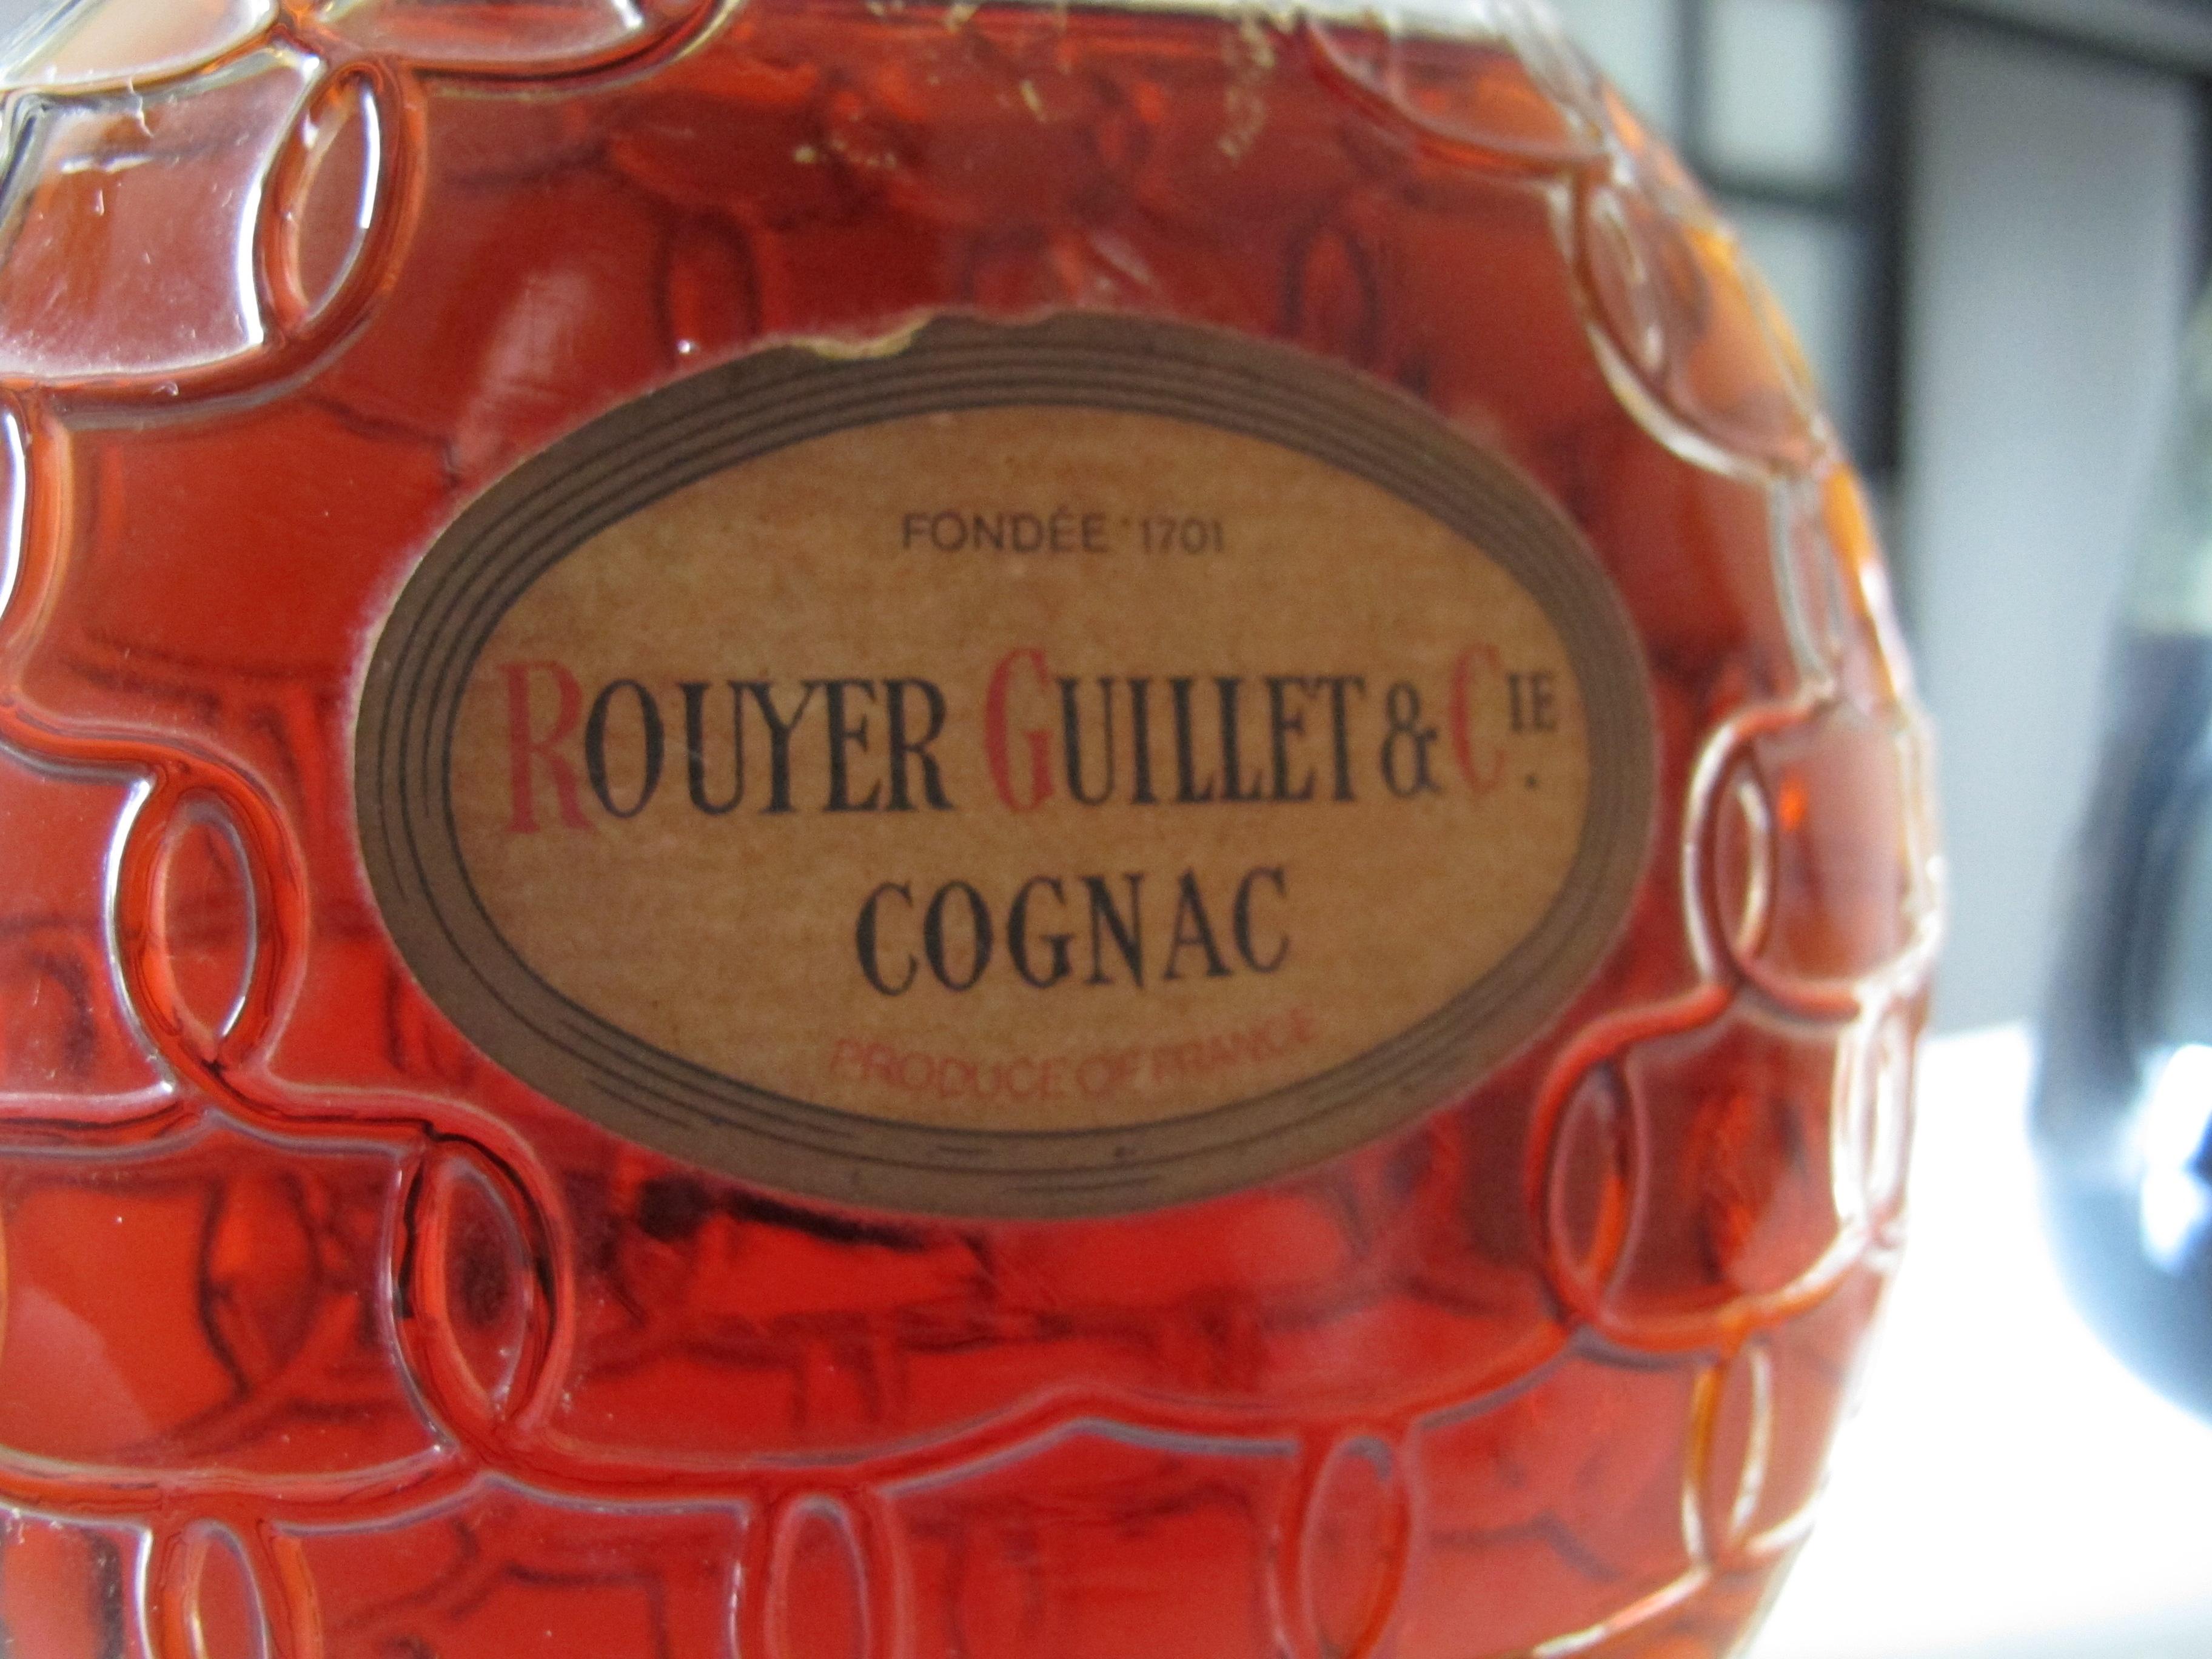 Reader owns a Rouyer Guillet & Cie Cognac Bottle